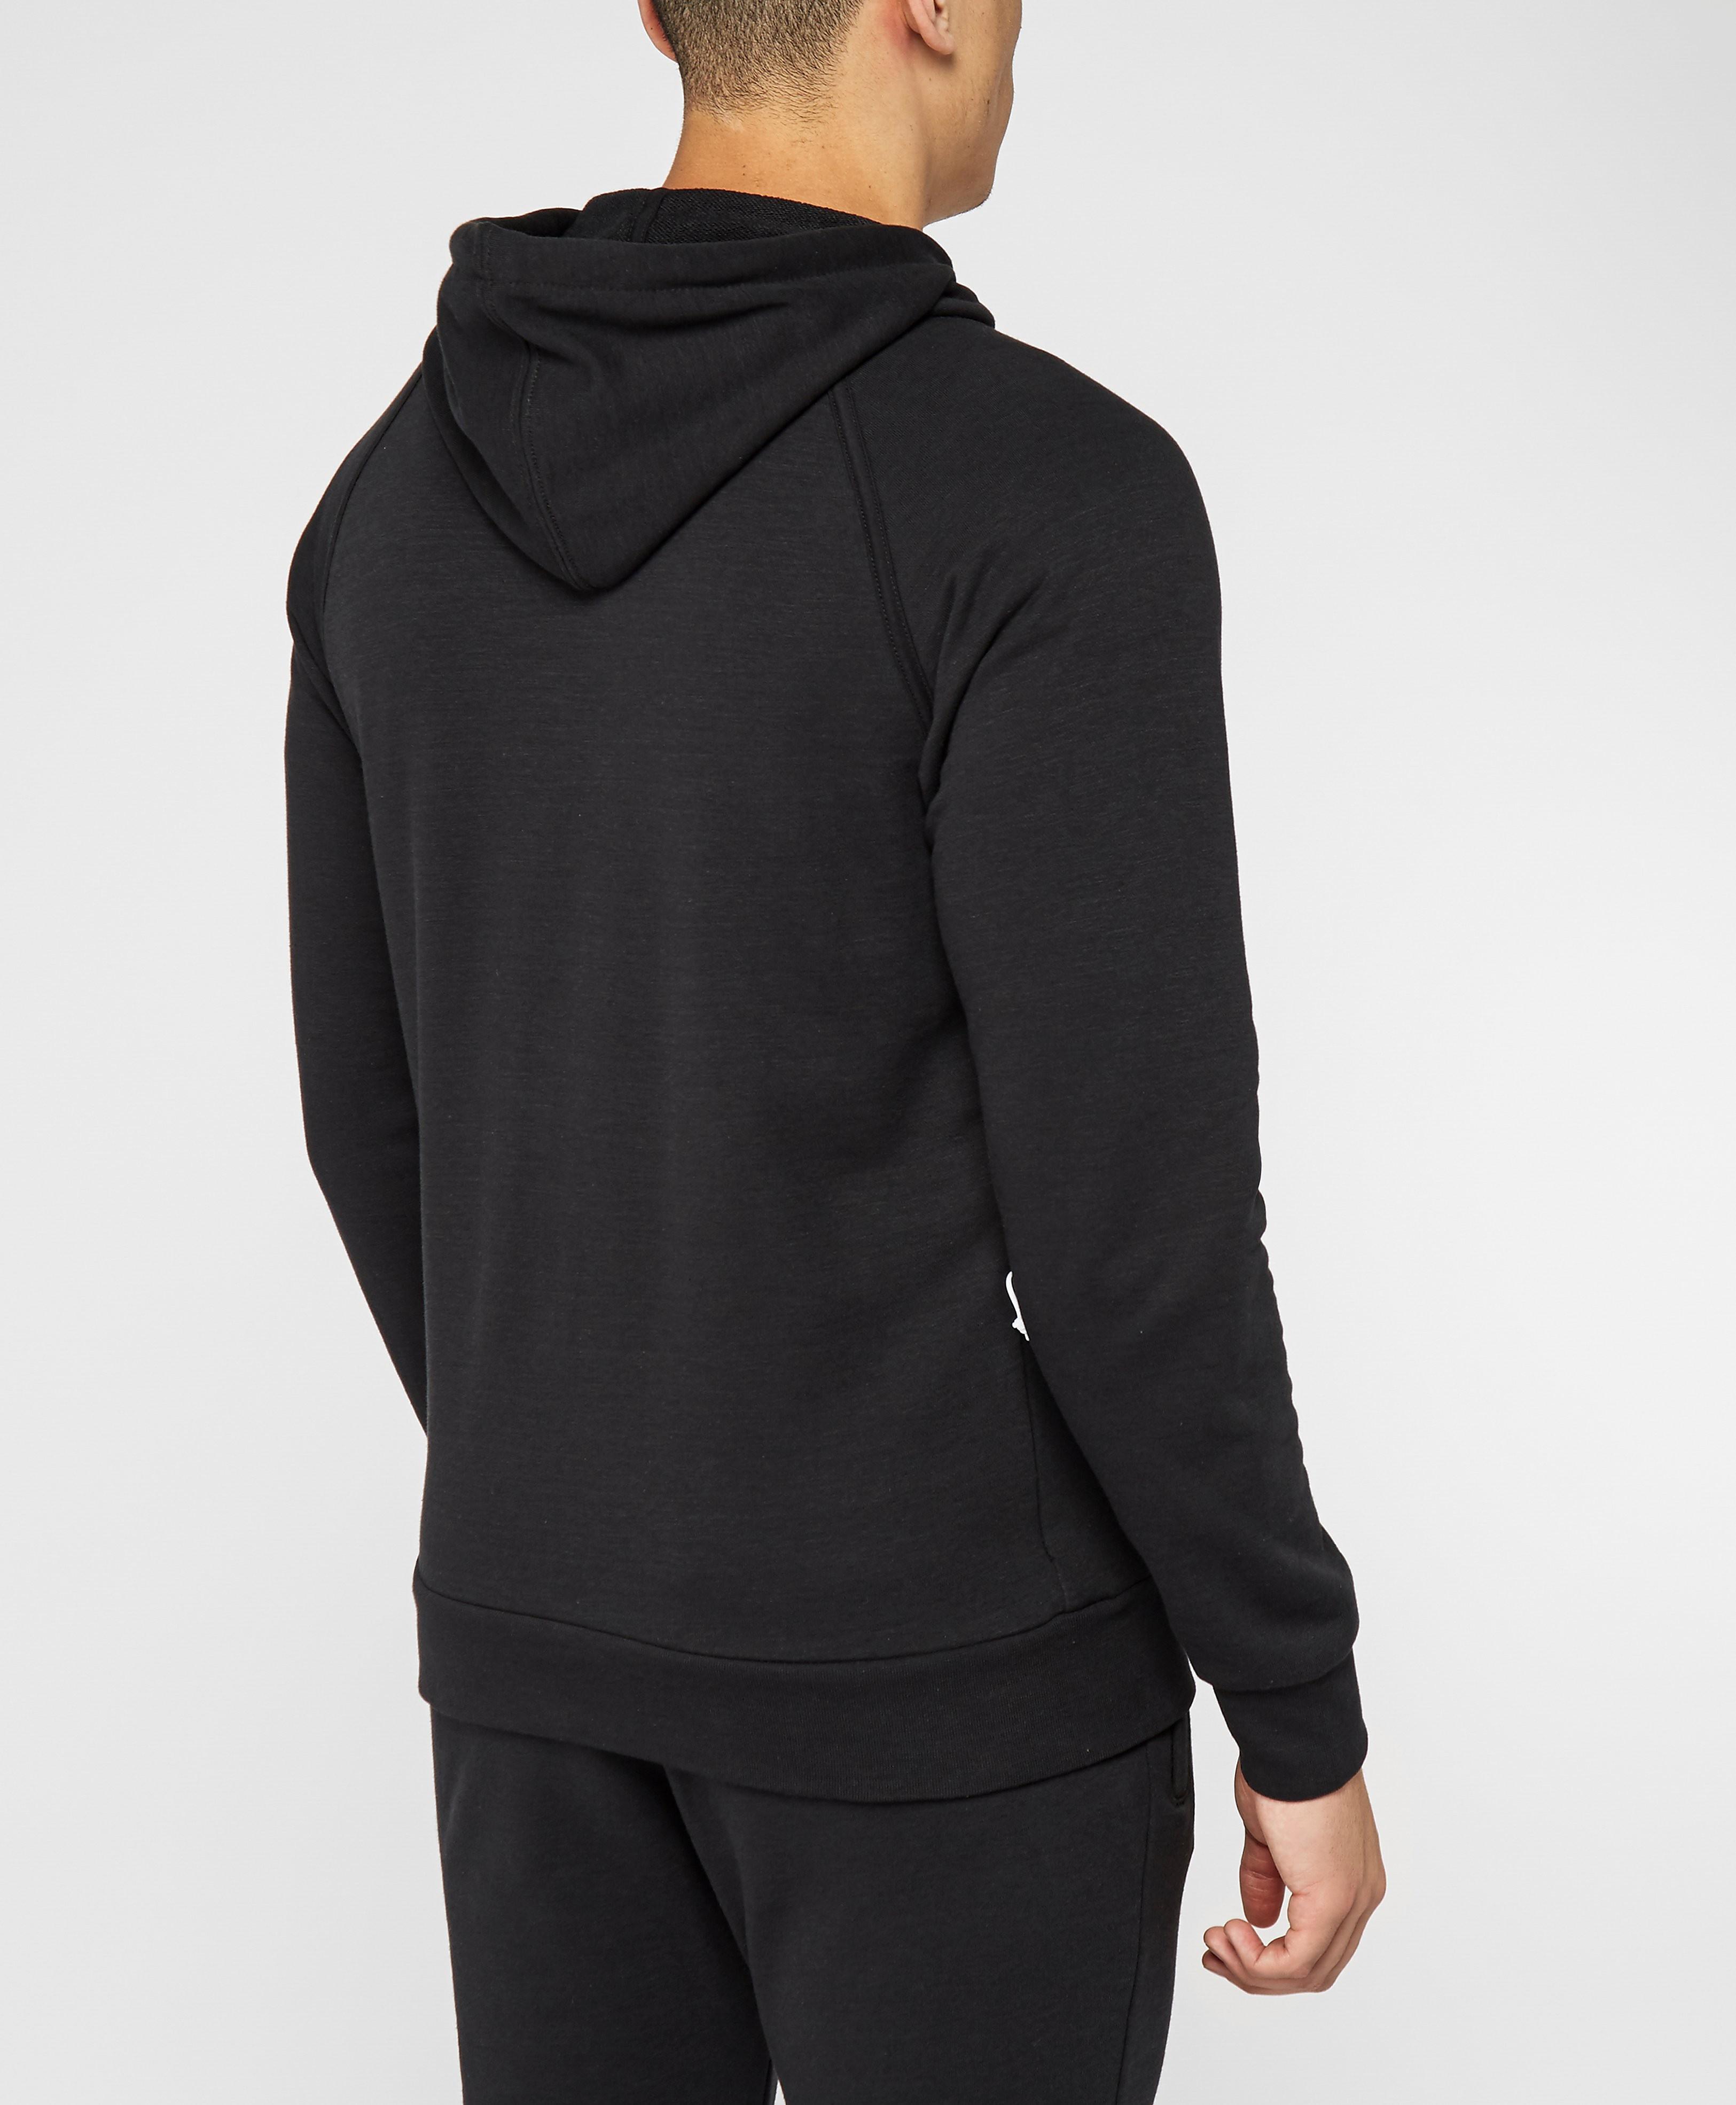 adidas Originals EF Marl Full Zip Hoody